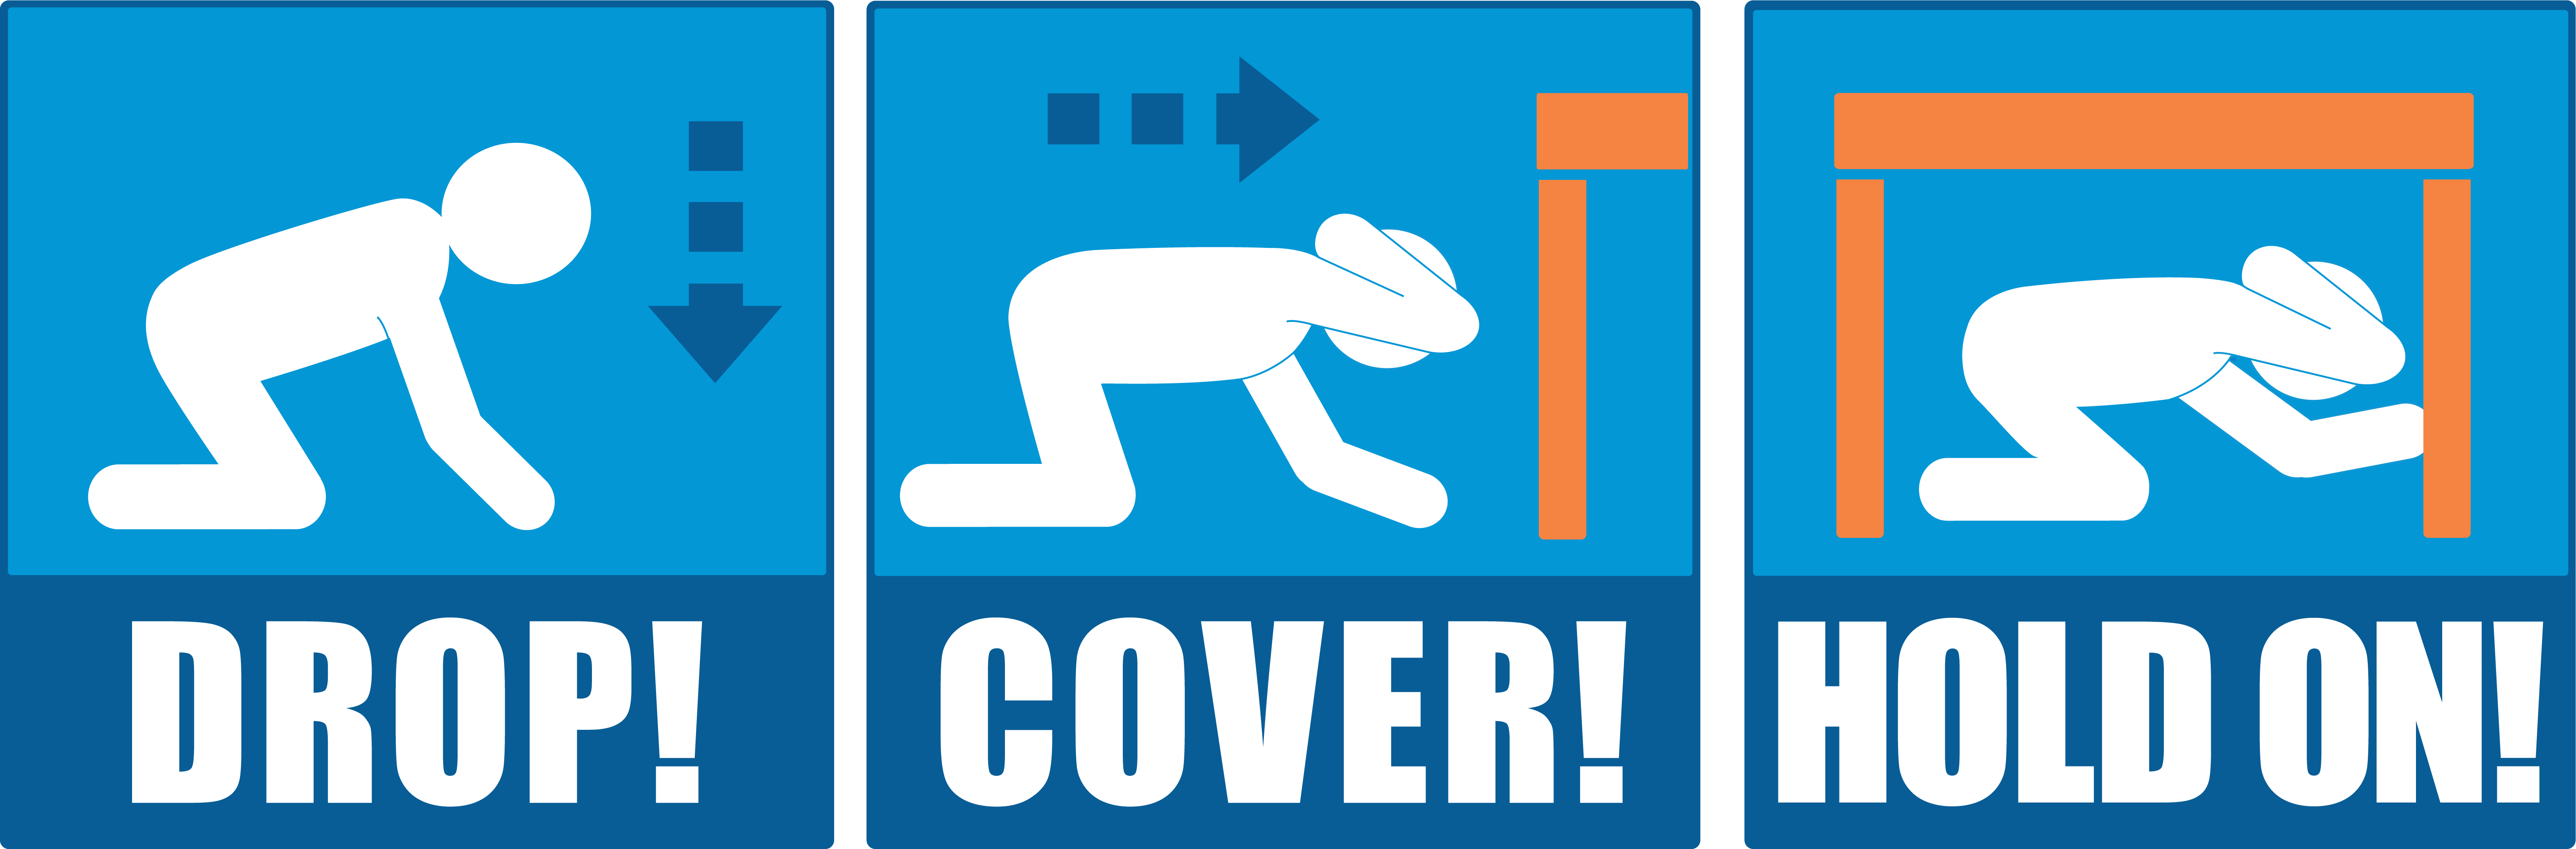 (Courtesy Southern California Earthquake Center) - Earthquake PNG HD